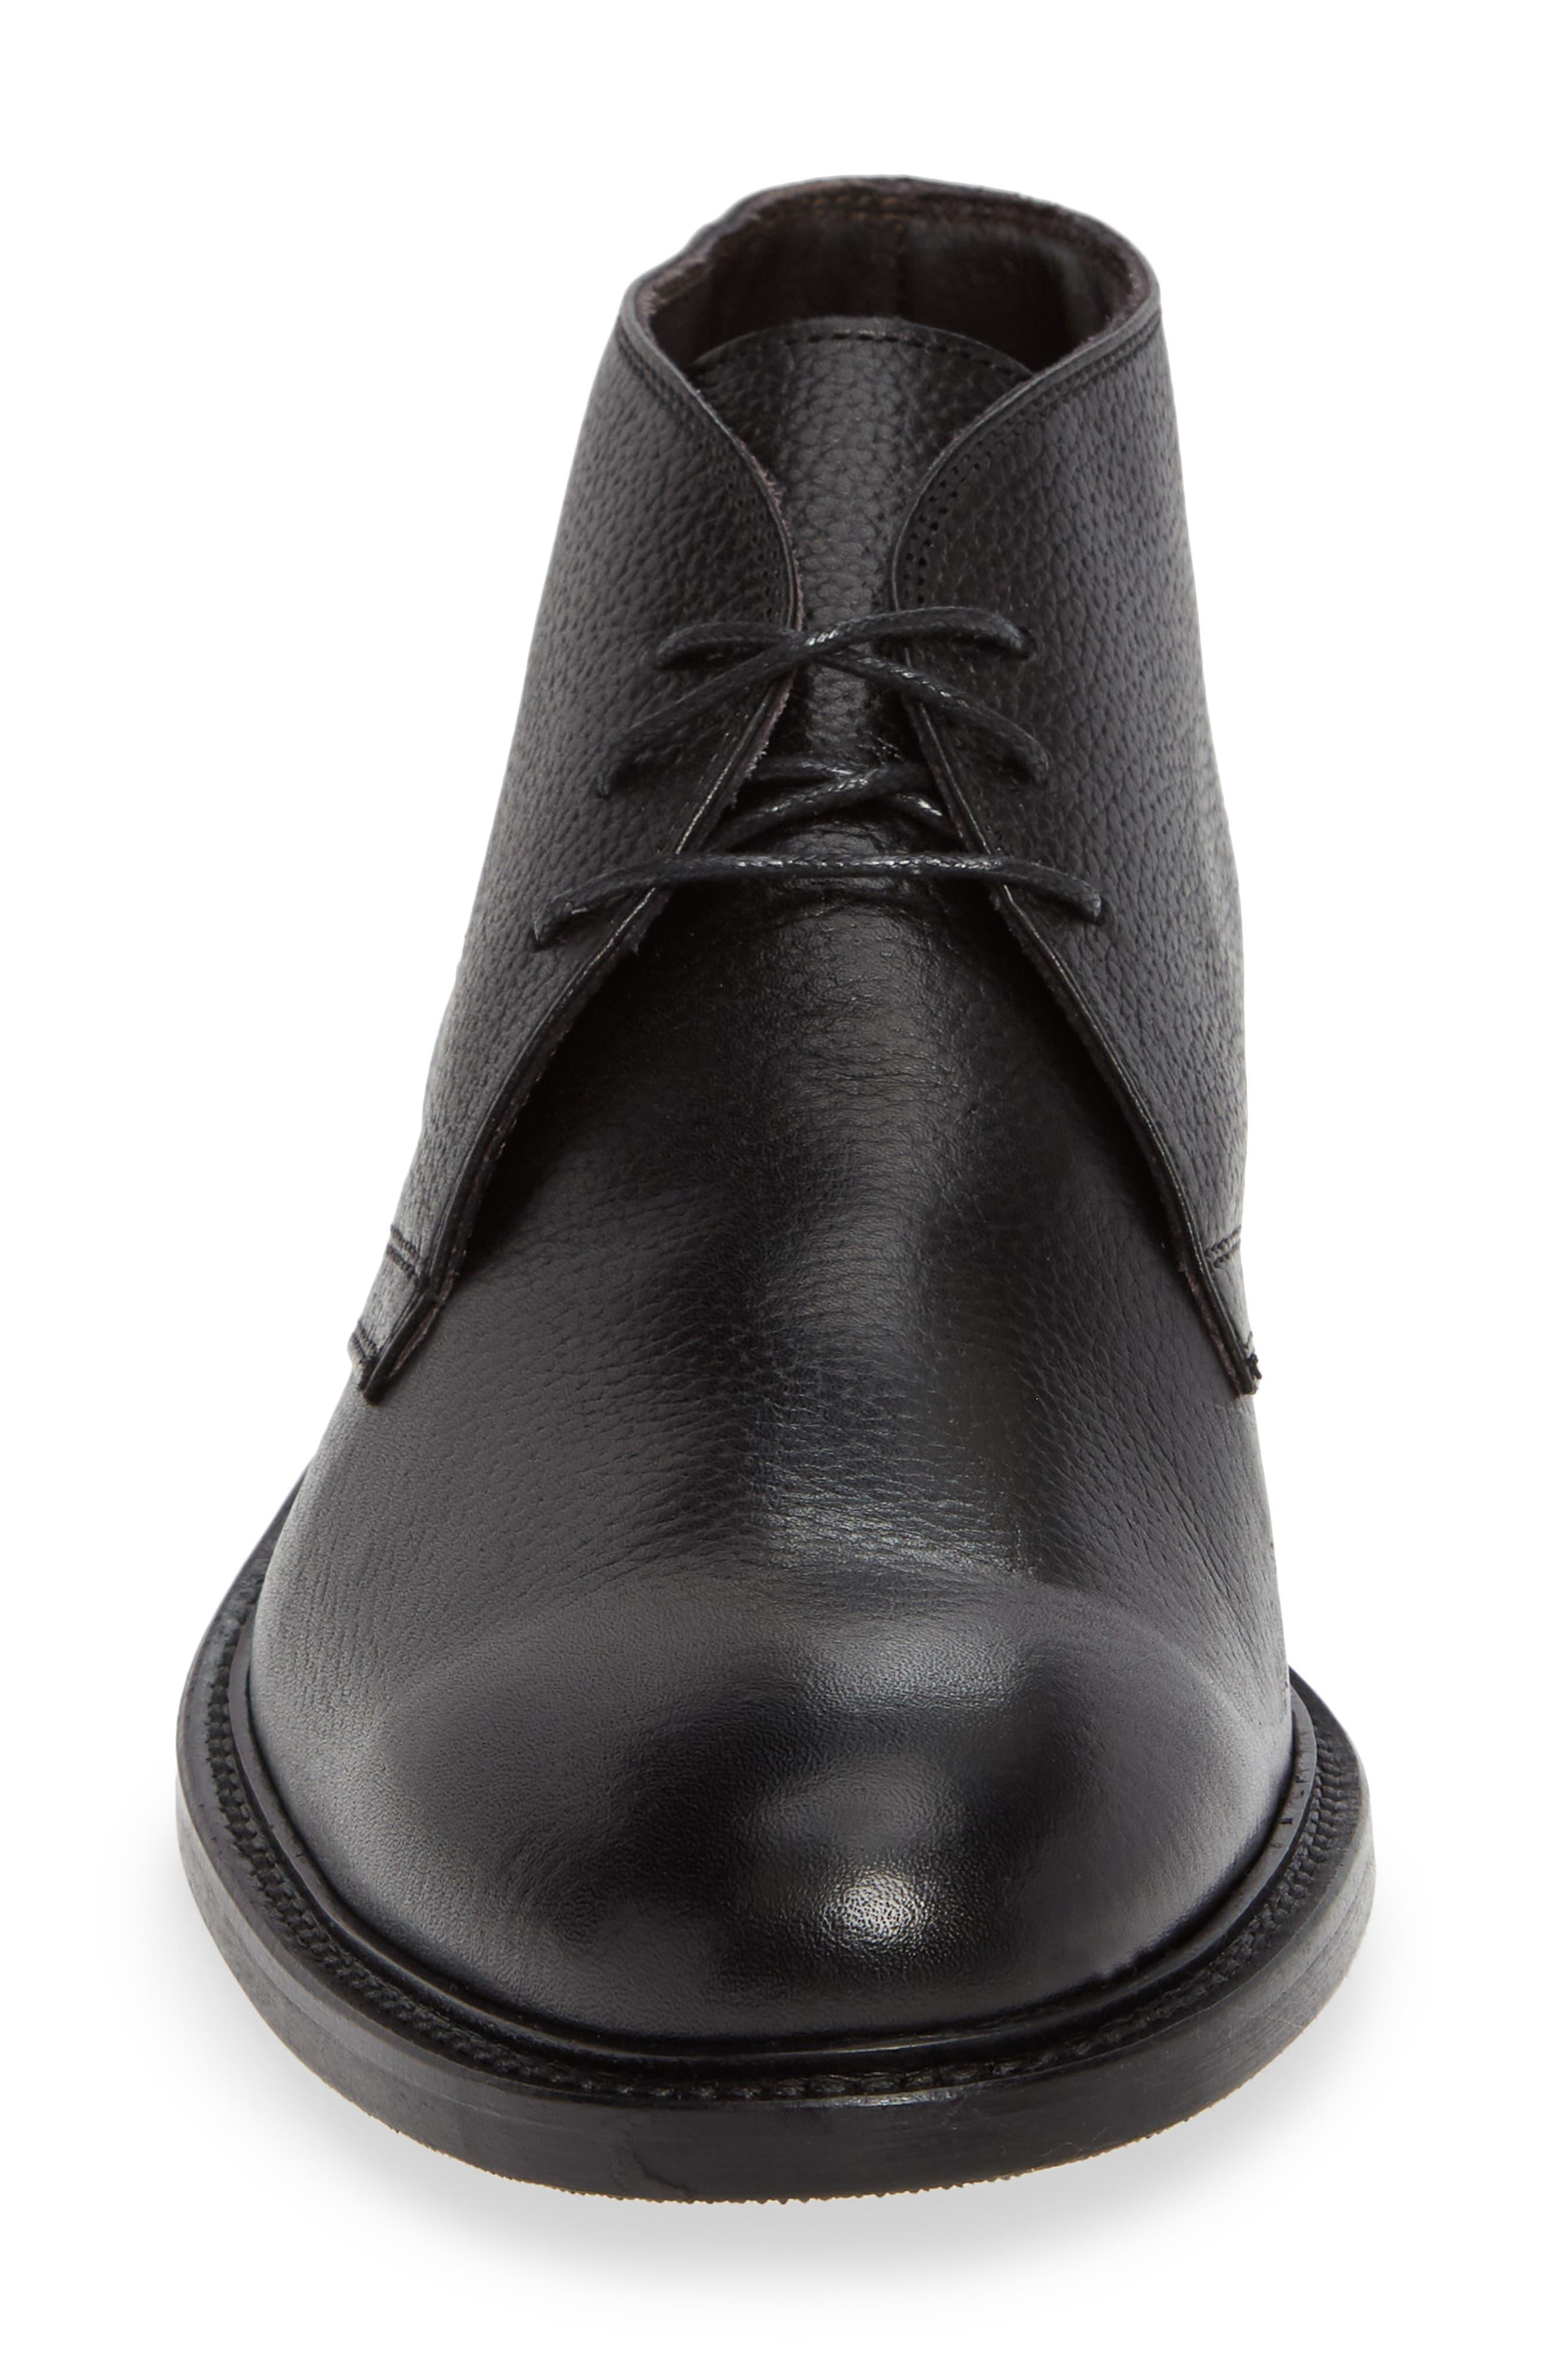 Bruin Plain Toe Chukka Boot,                             Alternate thumbnail 4, color,                             VITELLO STOMPA NERO LEATHER